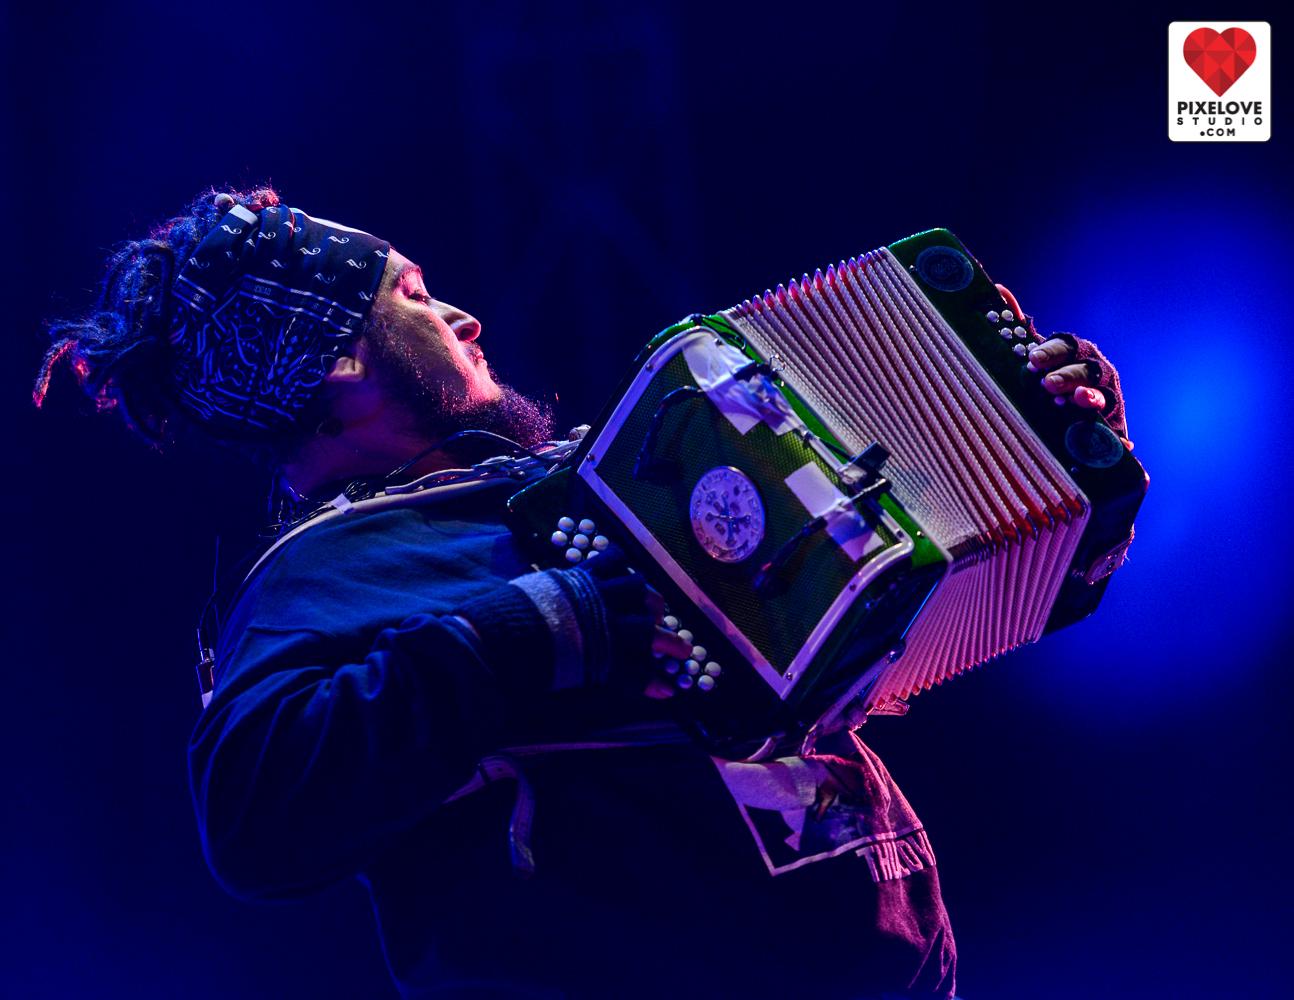 pixelovestudio-foto-musical-tecate-bajio-2018-2